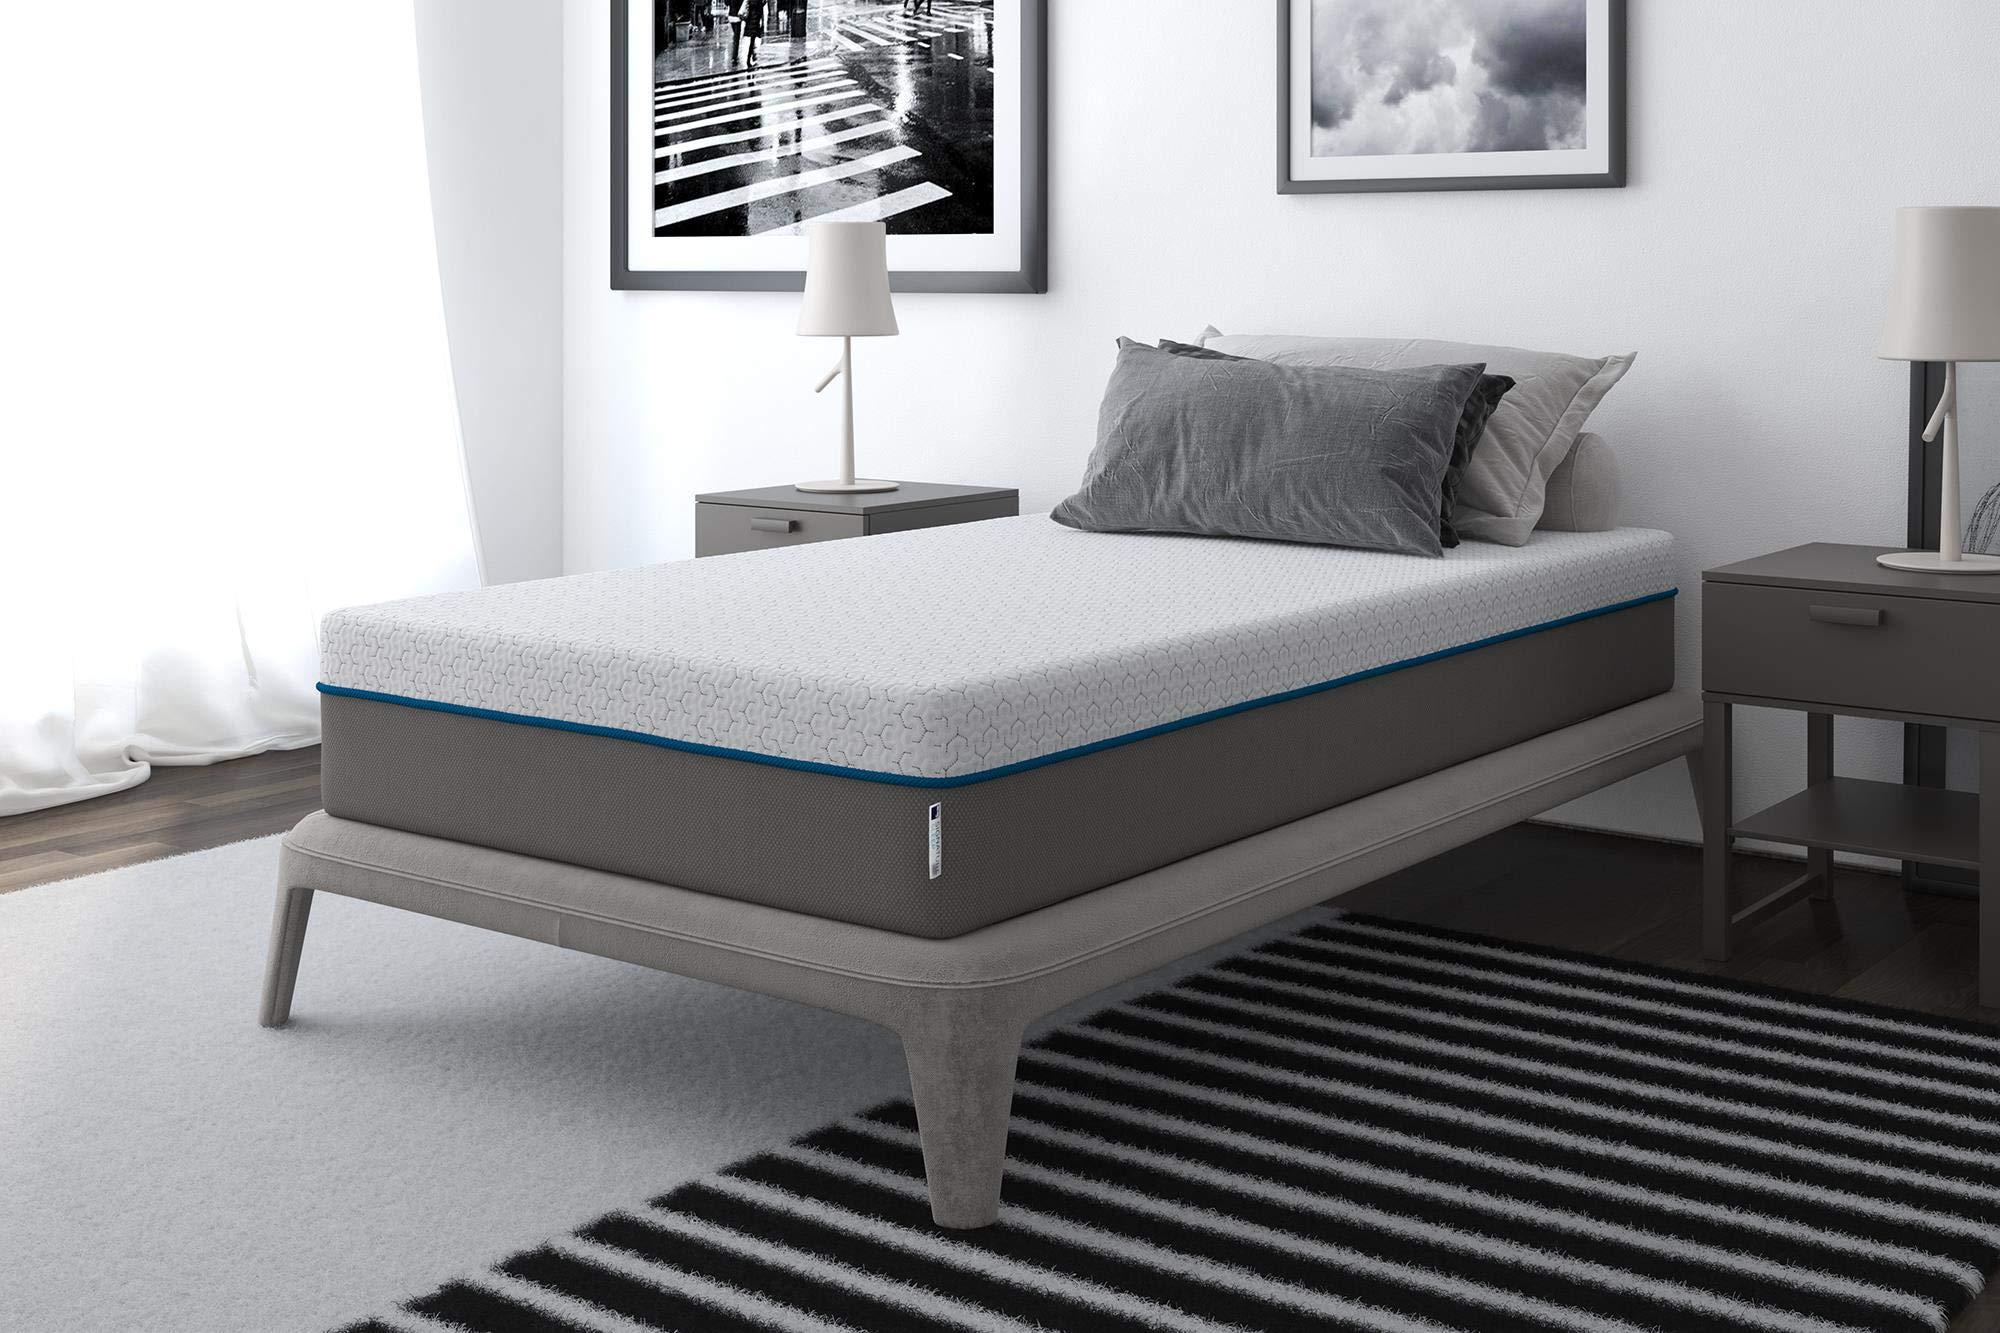 Signature Sleep Flex 10-Inch Charcoal Gel Memory Foam Mattress, Twin Size